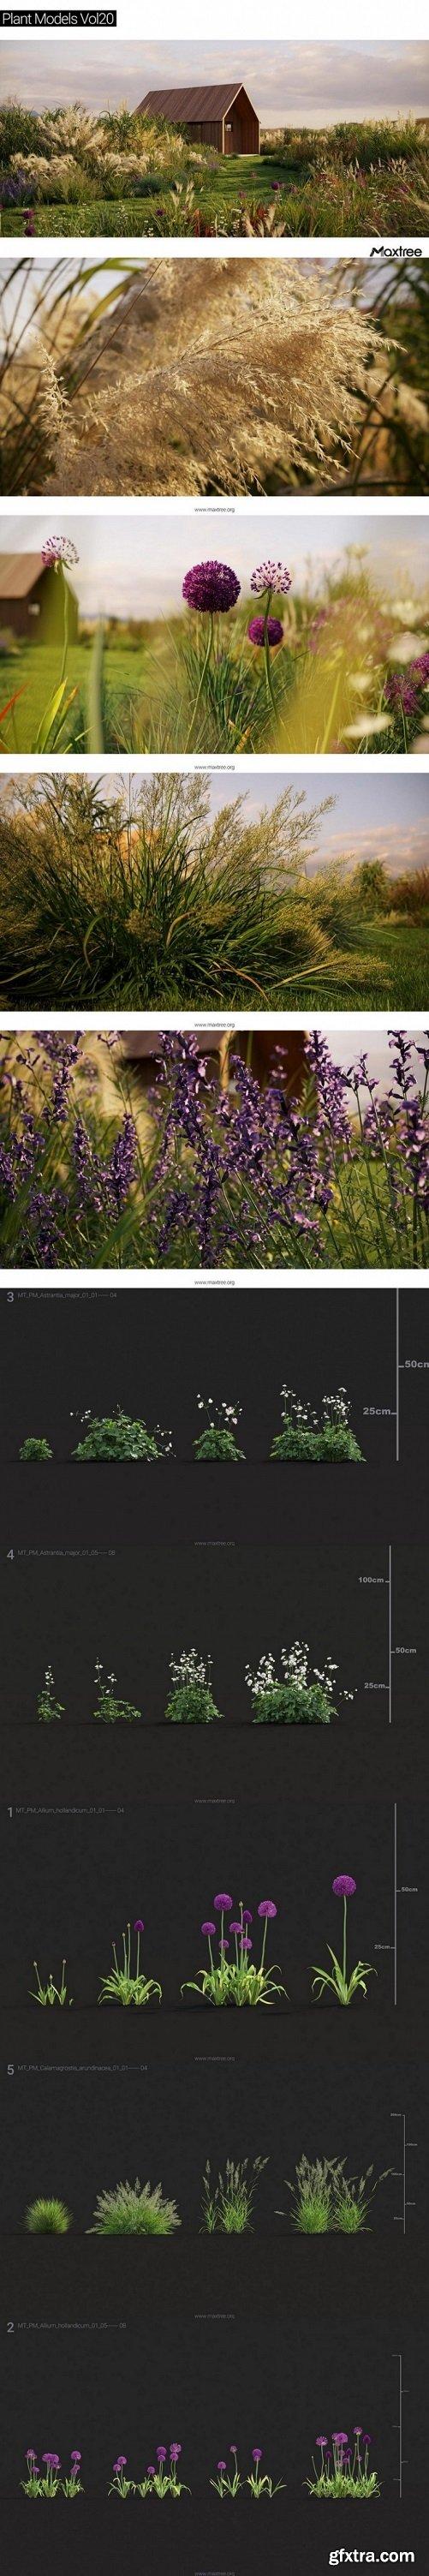 Maxtree - Plant Models Vol 20